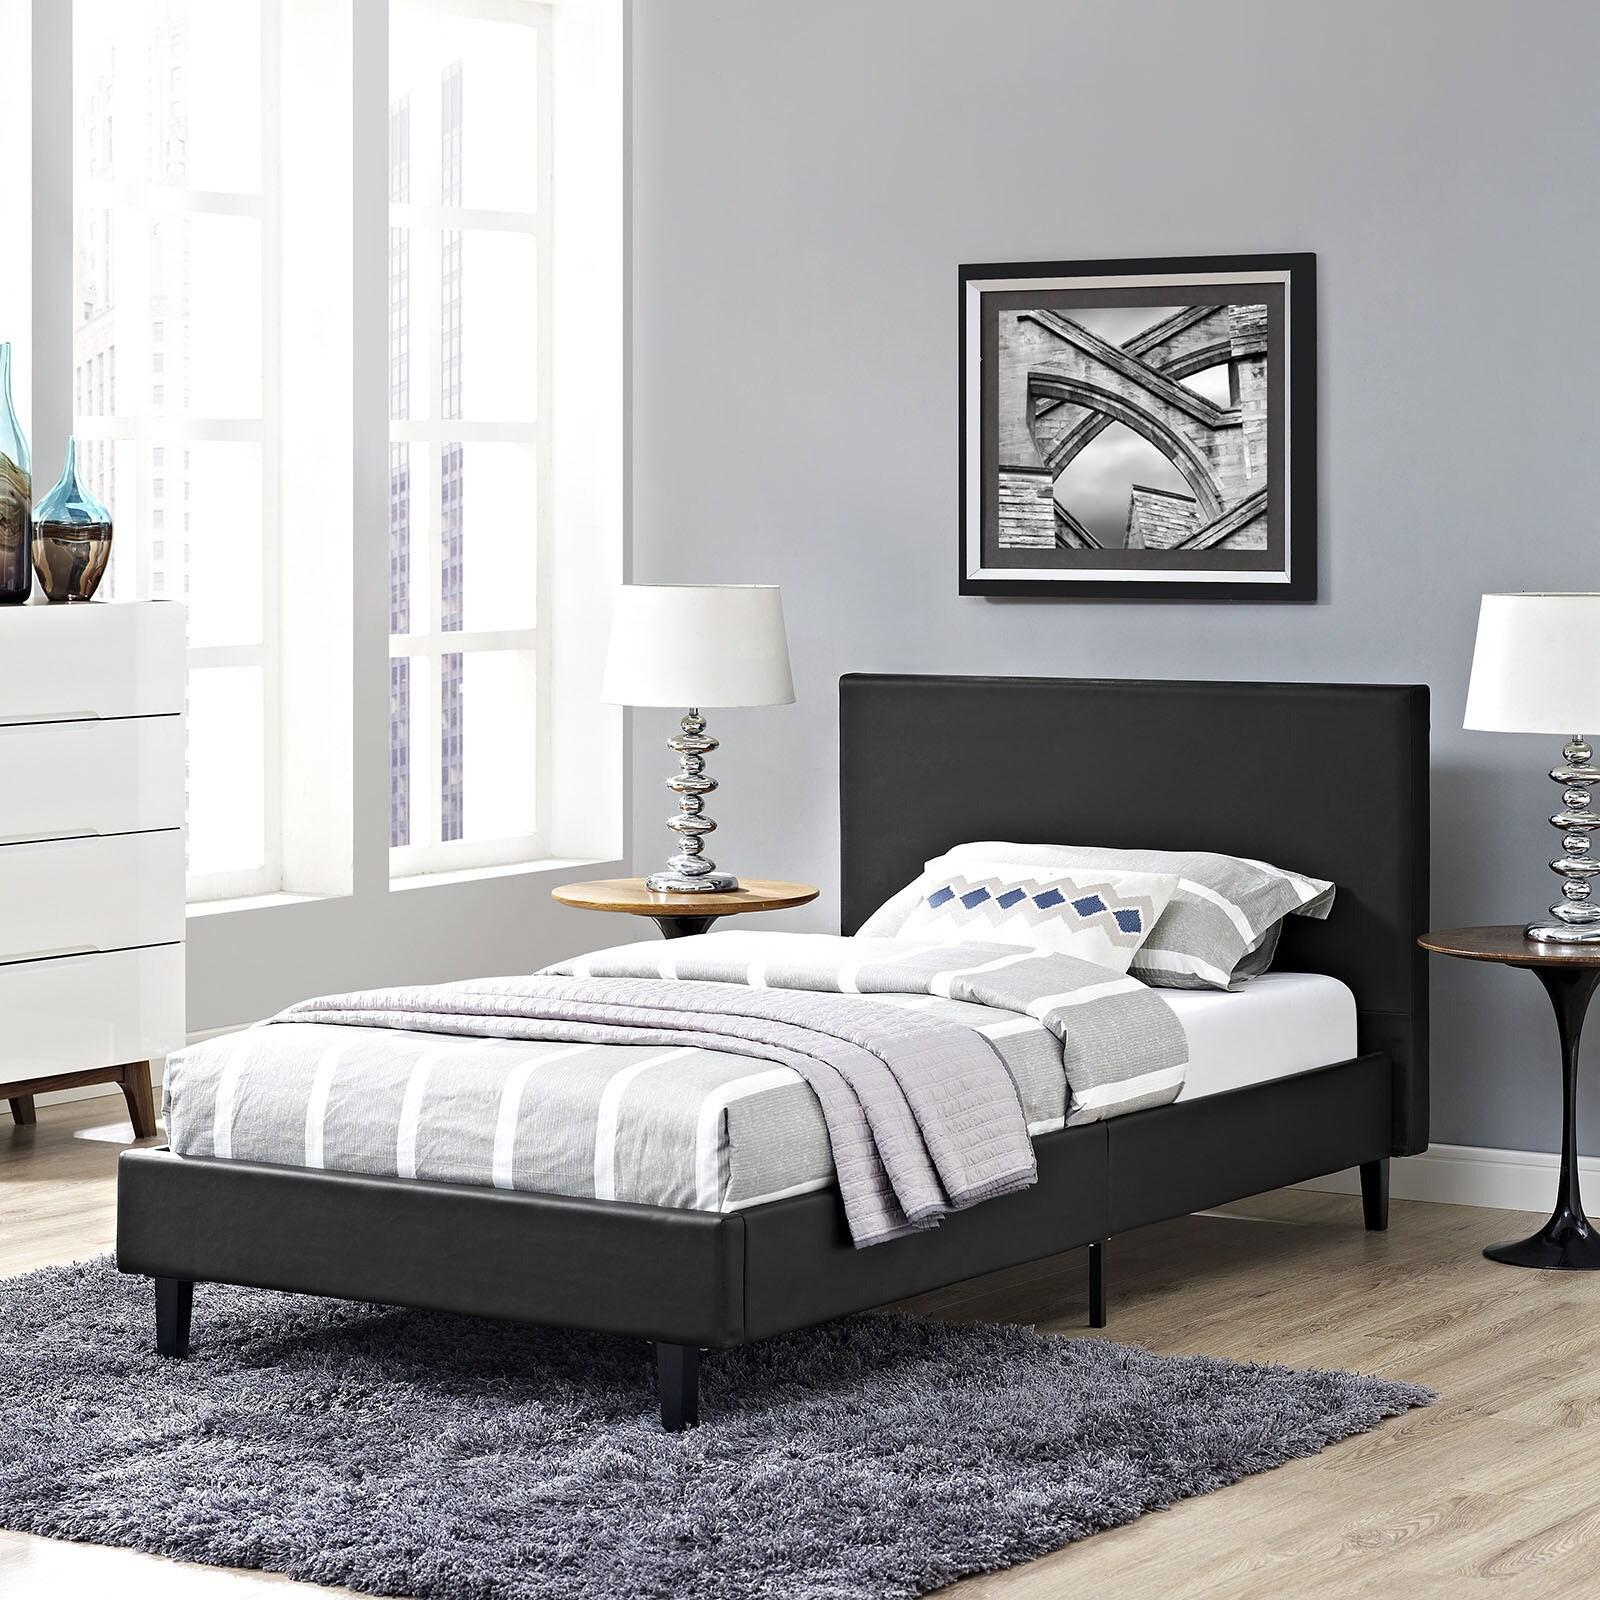 Modway Anya Vinyl Twin-size Platform Bed (White - White F...